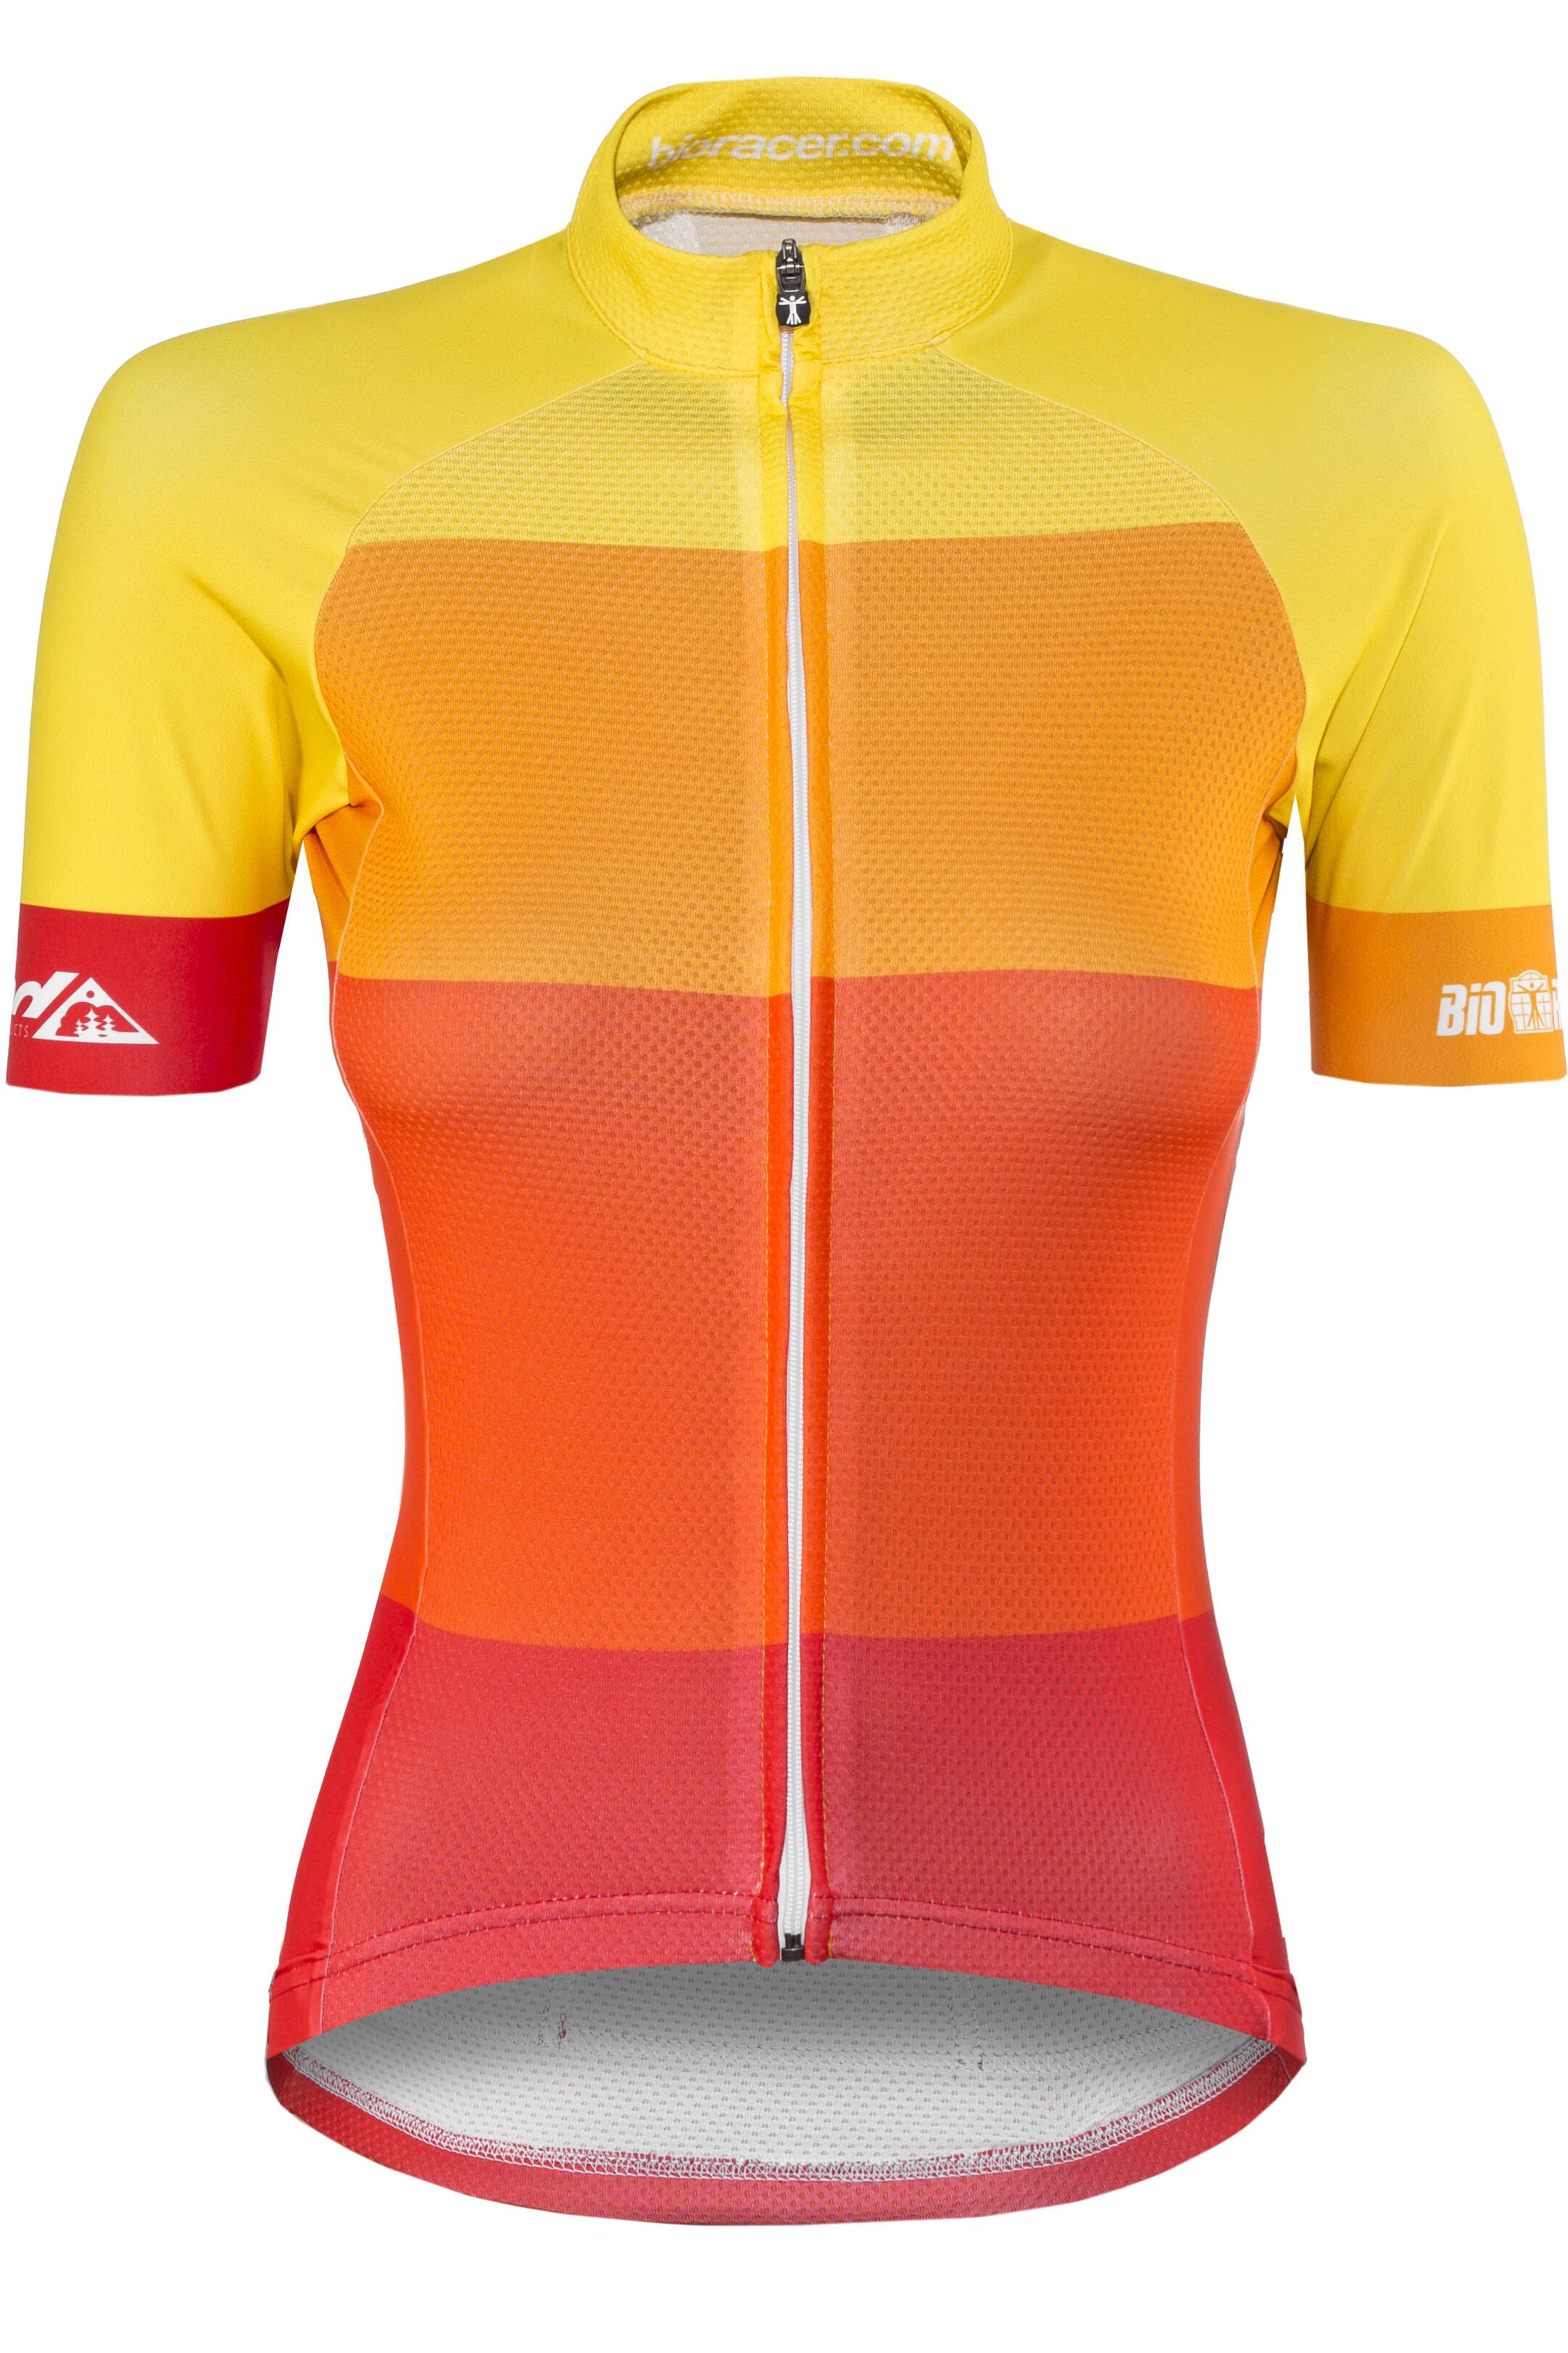 60ce437e1bc89 Red Cycling Products Colorblock Race - Maillot manga corta Mujer -  amarillo rojo